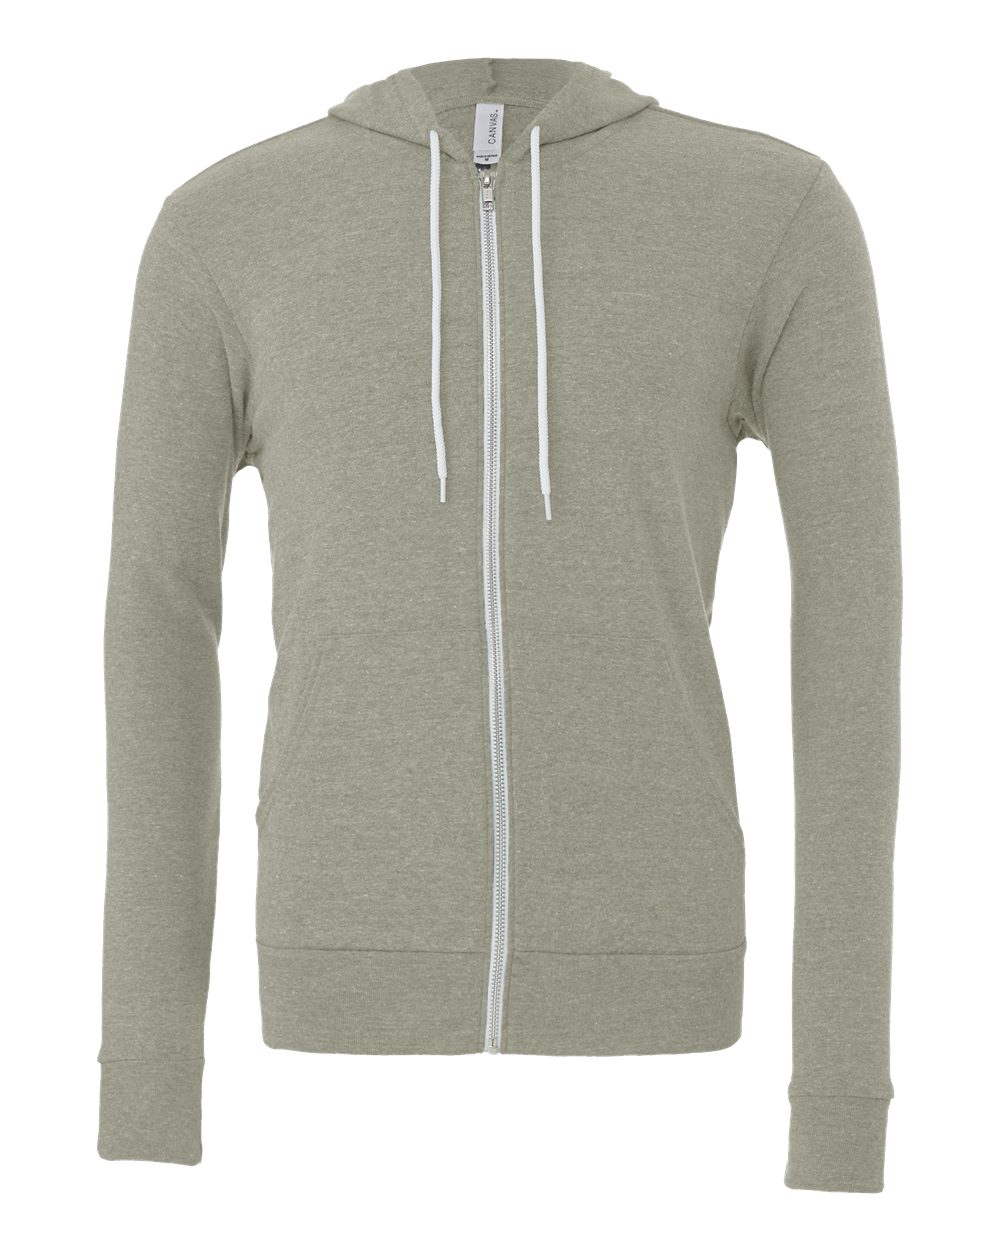 Bella-Canvas-Unisex-Full-Zip-Up-Hooded-Sweatshirt-Blank-Hoodie-3739-up-to-3XL thumbnail 57